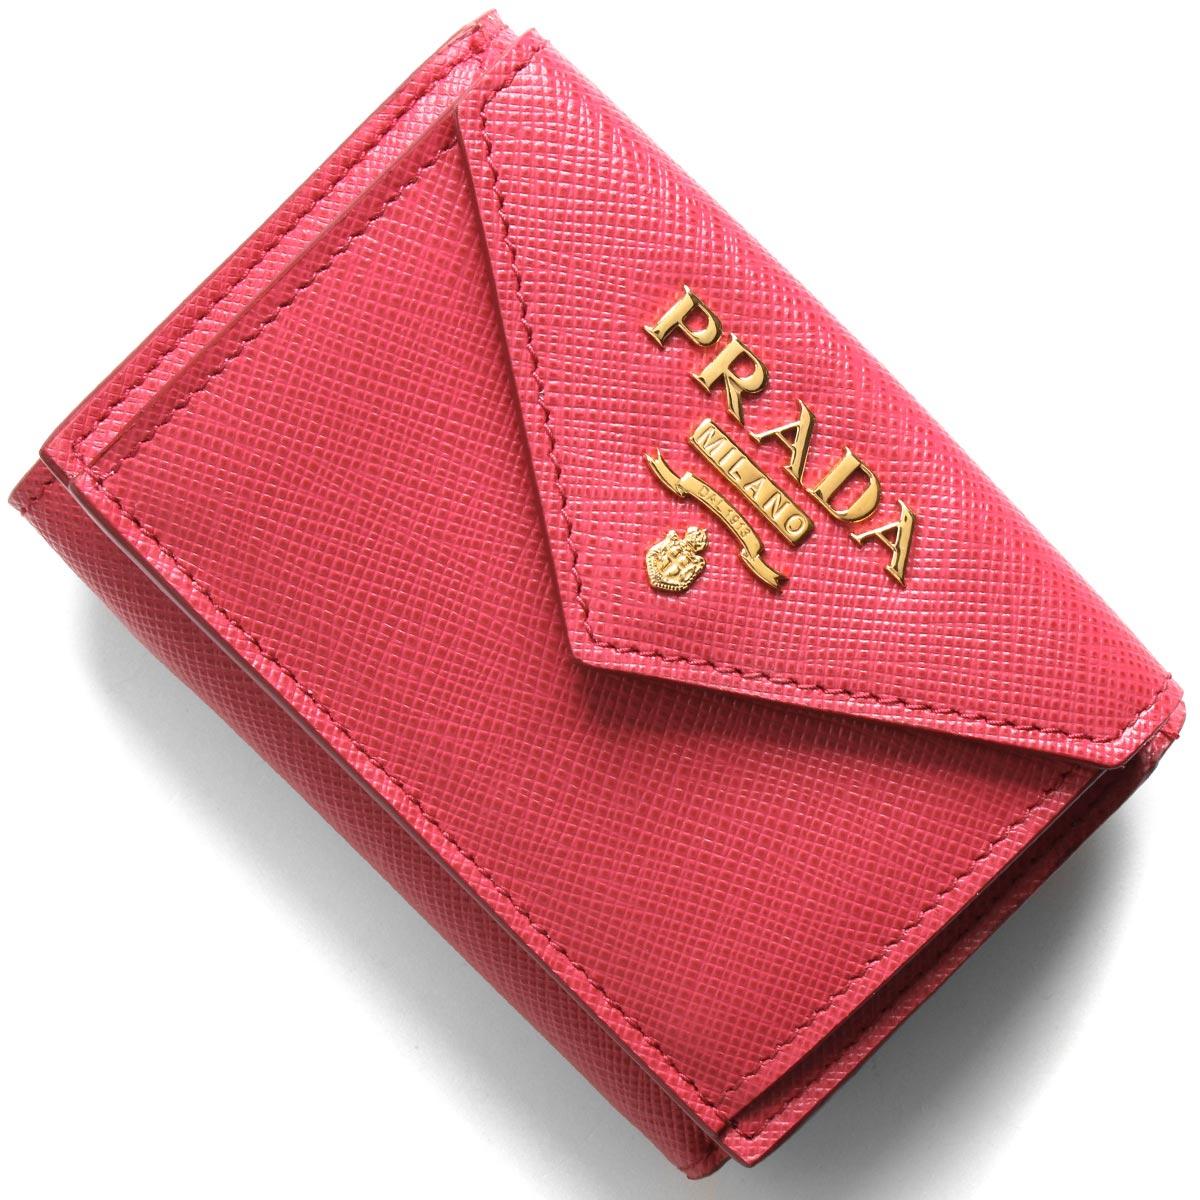 PRADA(プラダ)『サフィアーノレザー財布(1MH021_QWA)』